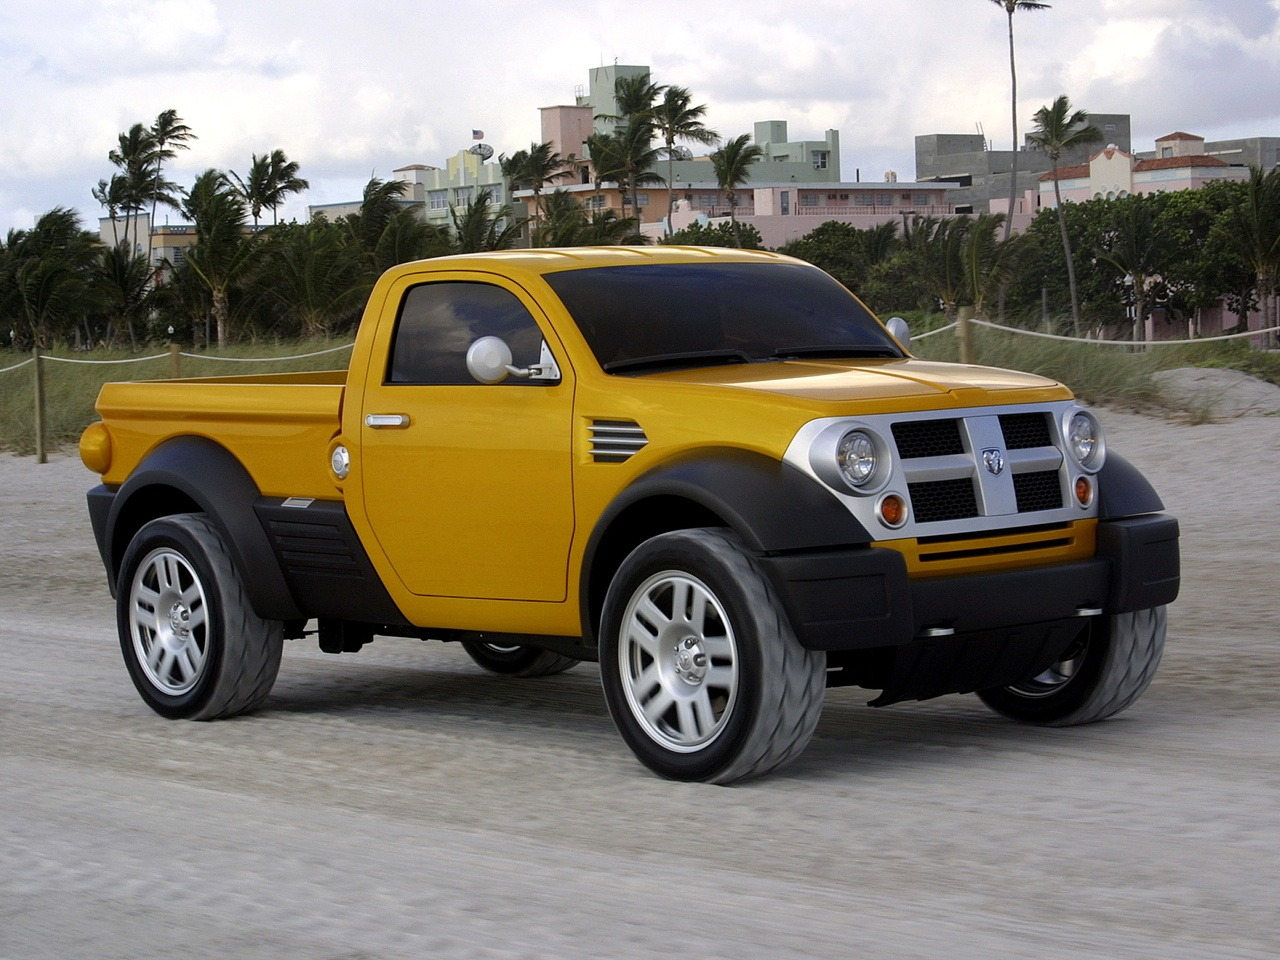 Dodge M80 Concept (2002)